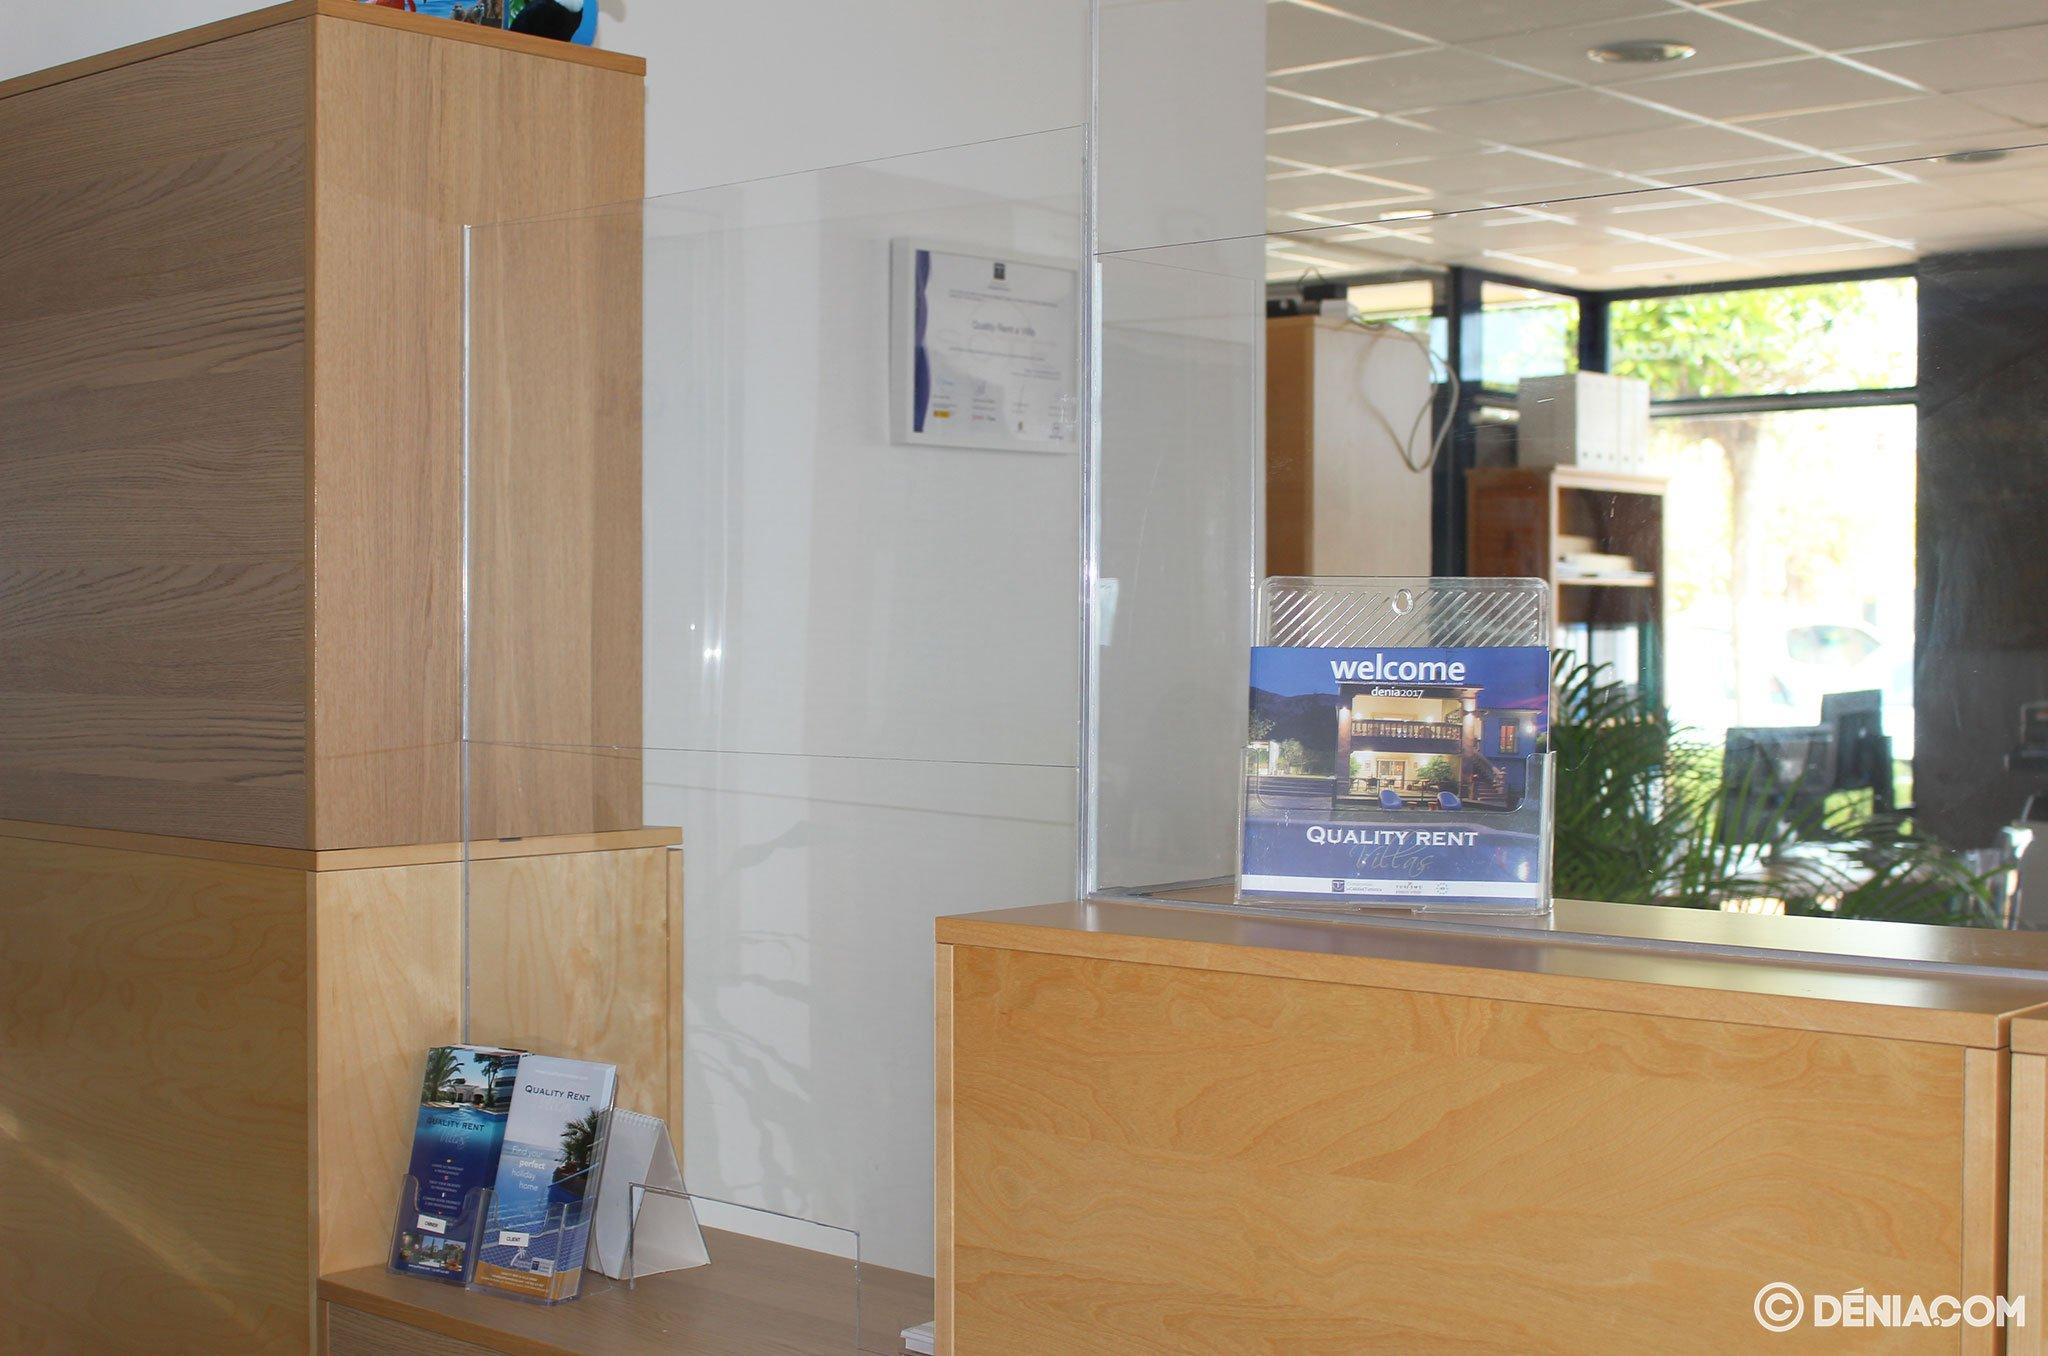 Mampara protectora en el interior de la oficina – Quality Rent a Villa